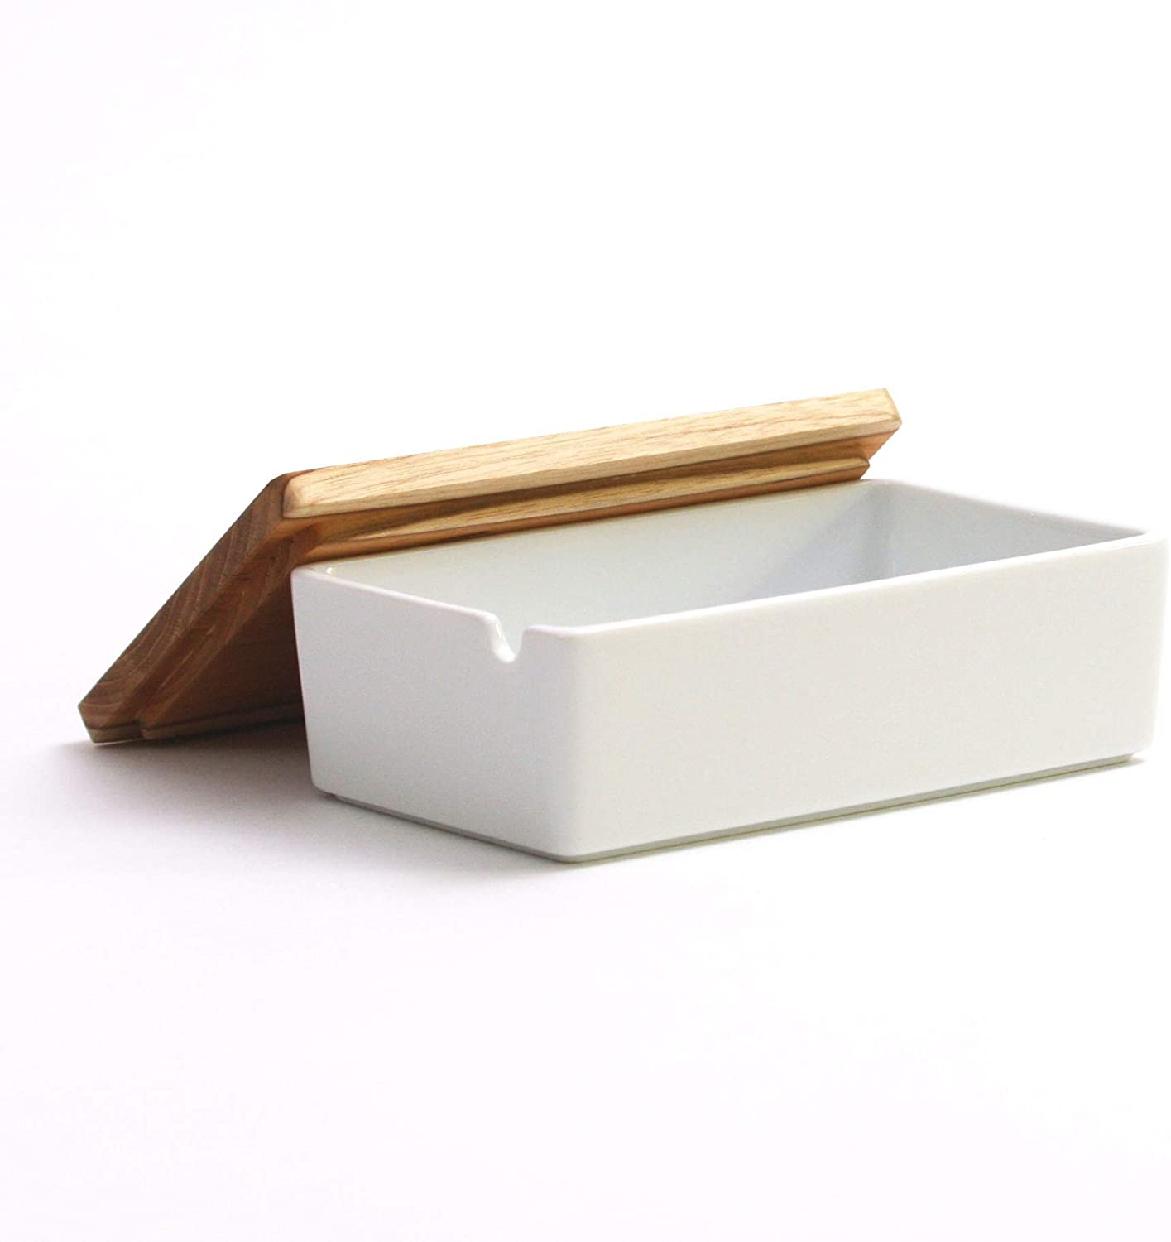 B STYLE KITCHEN(ビースタイルキッチン)木製バターケース 32401の商品画像2